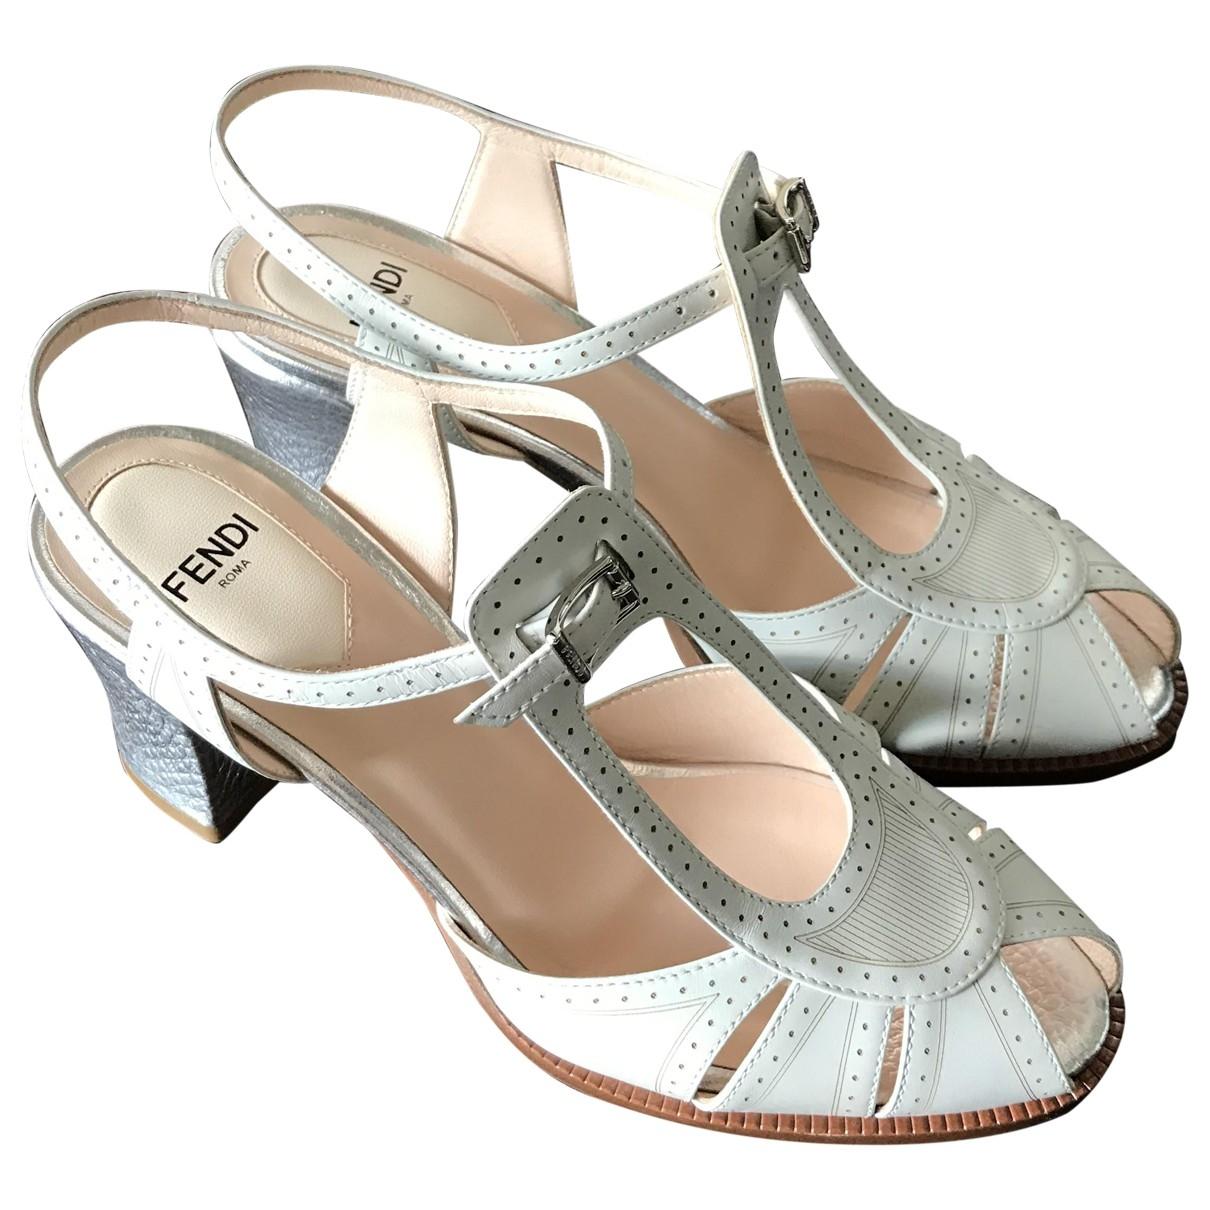 Fendi \N White Leather Sandals for Women 36 EU